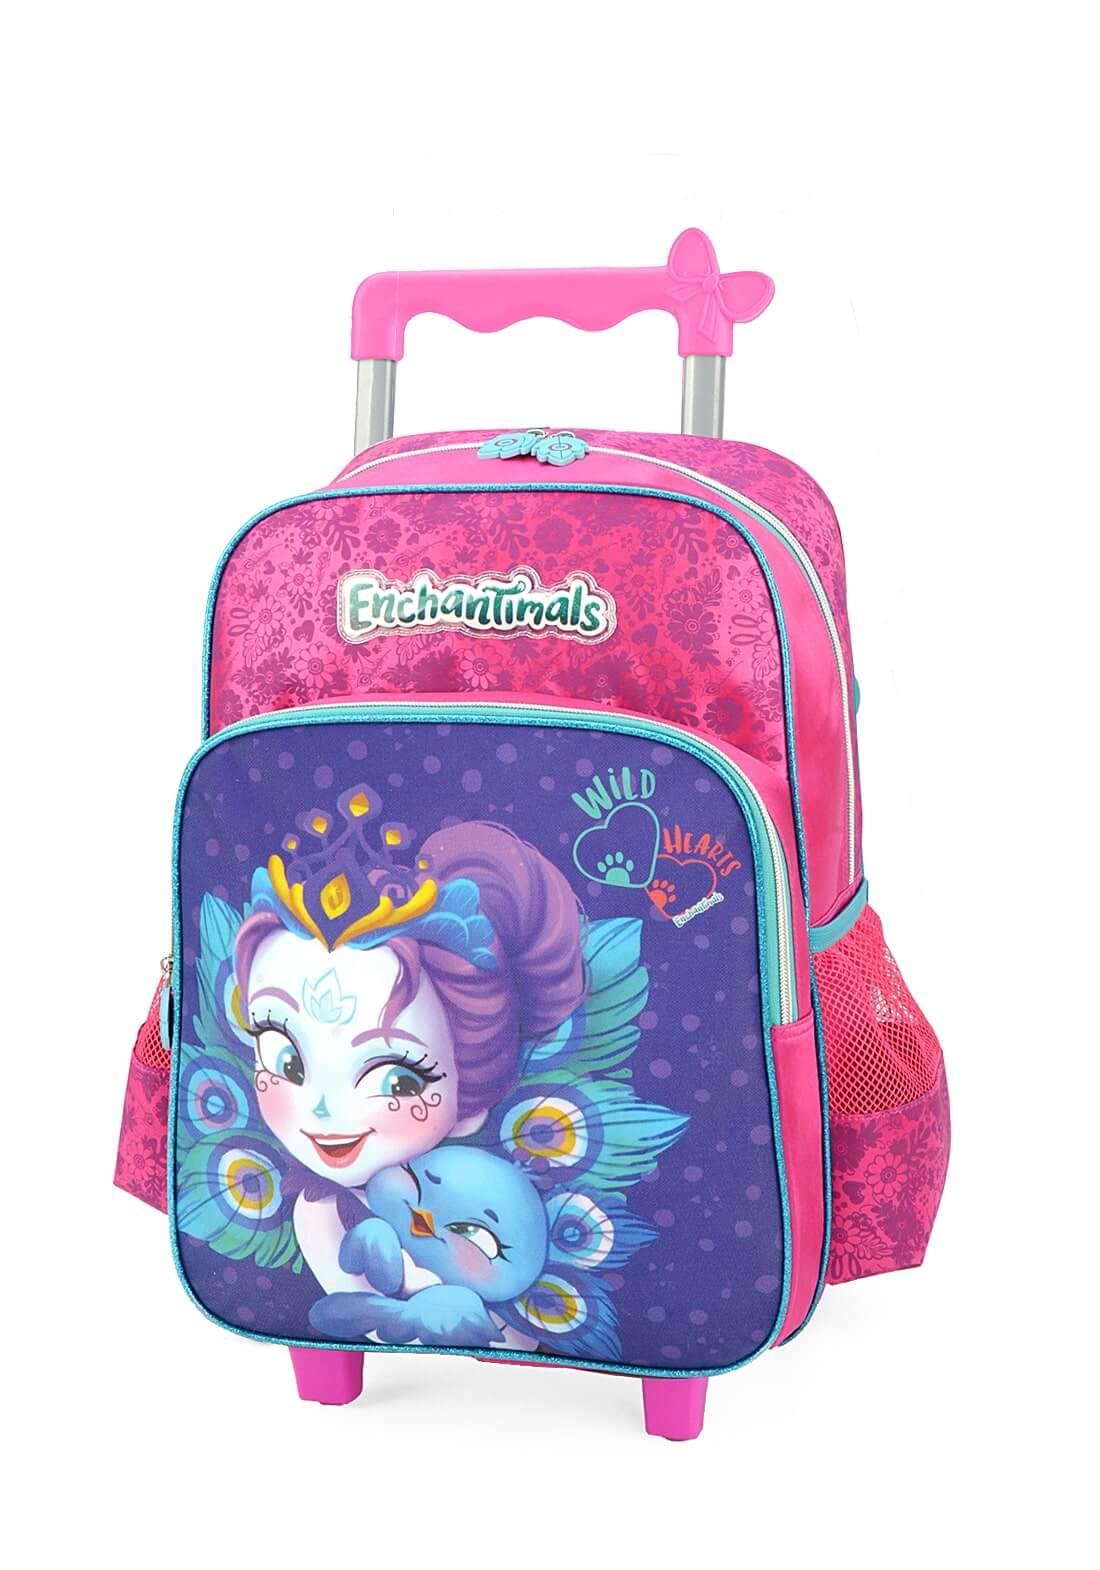 Kit Escolar Mochila de Rodinha + Lancheira Enchantimals Pink